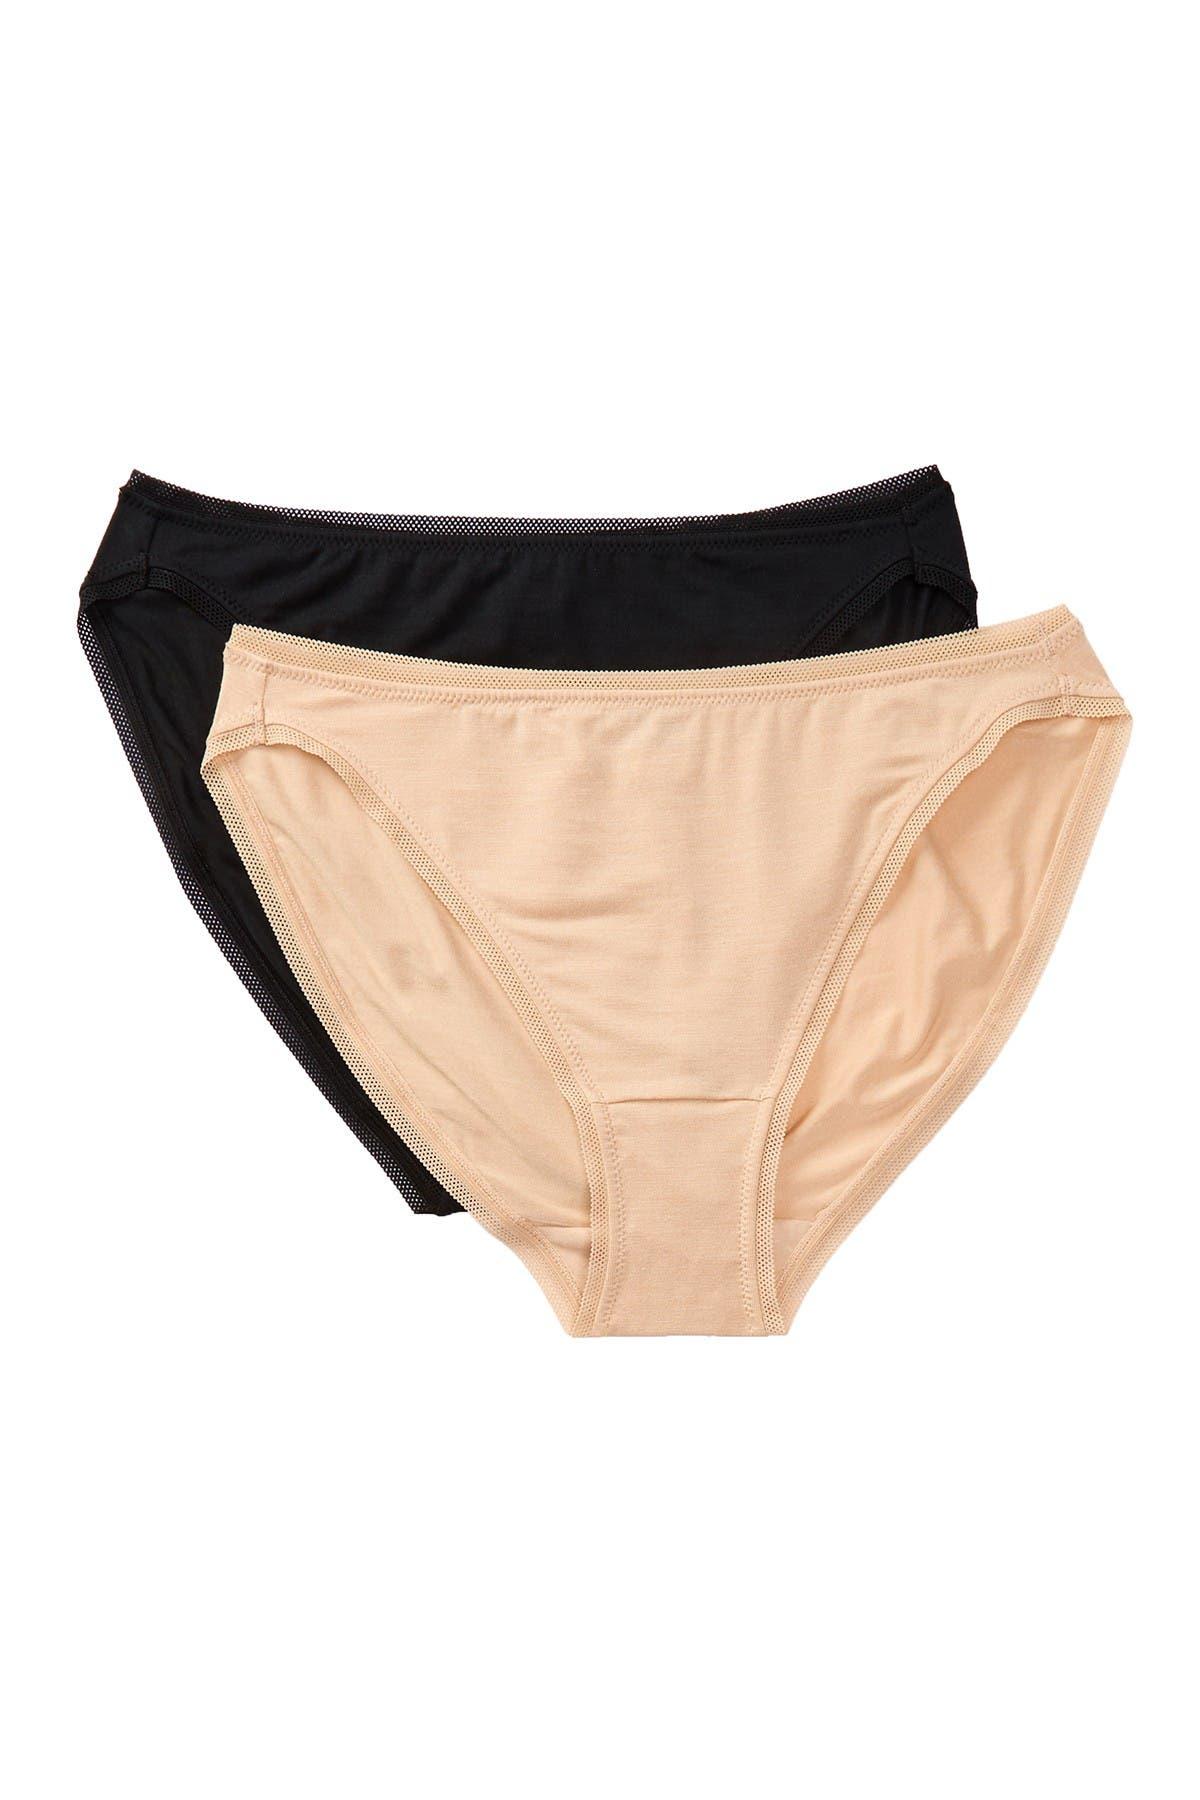 Image of Felina So-Smooth High Cut Panties - Pack of 2